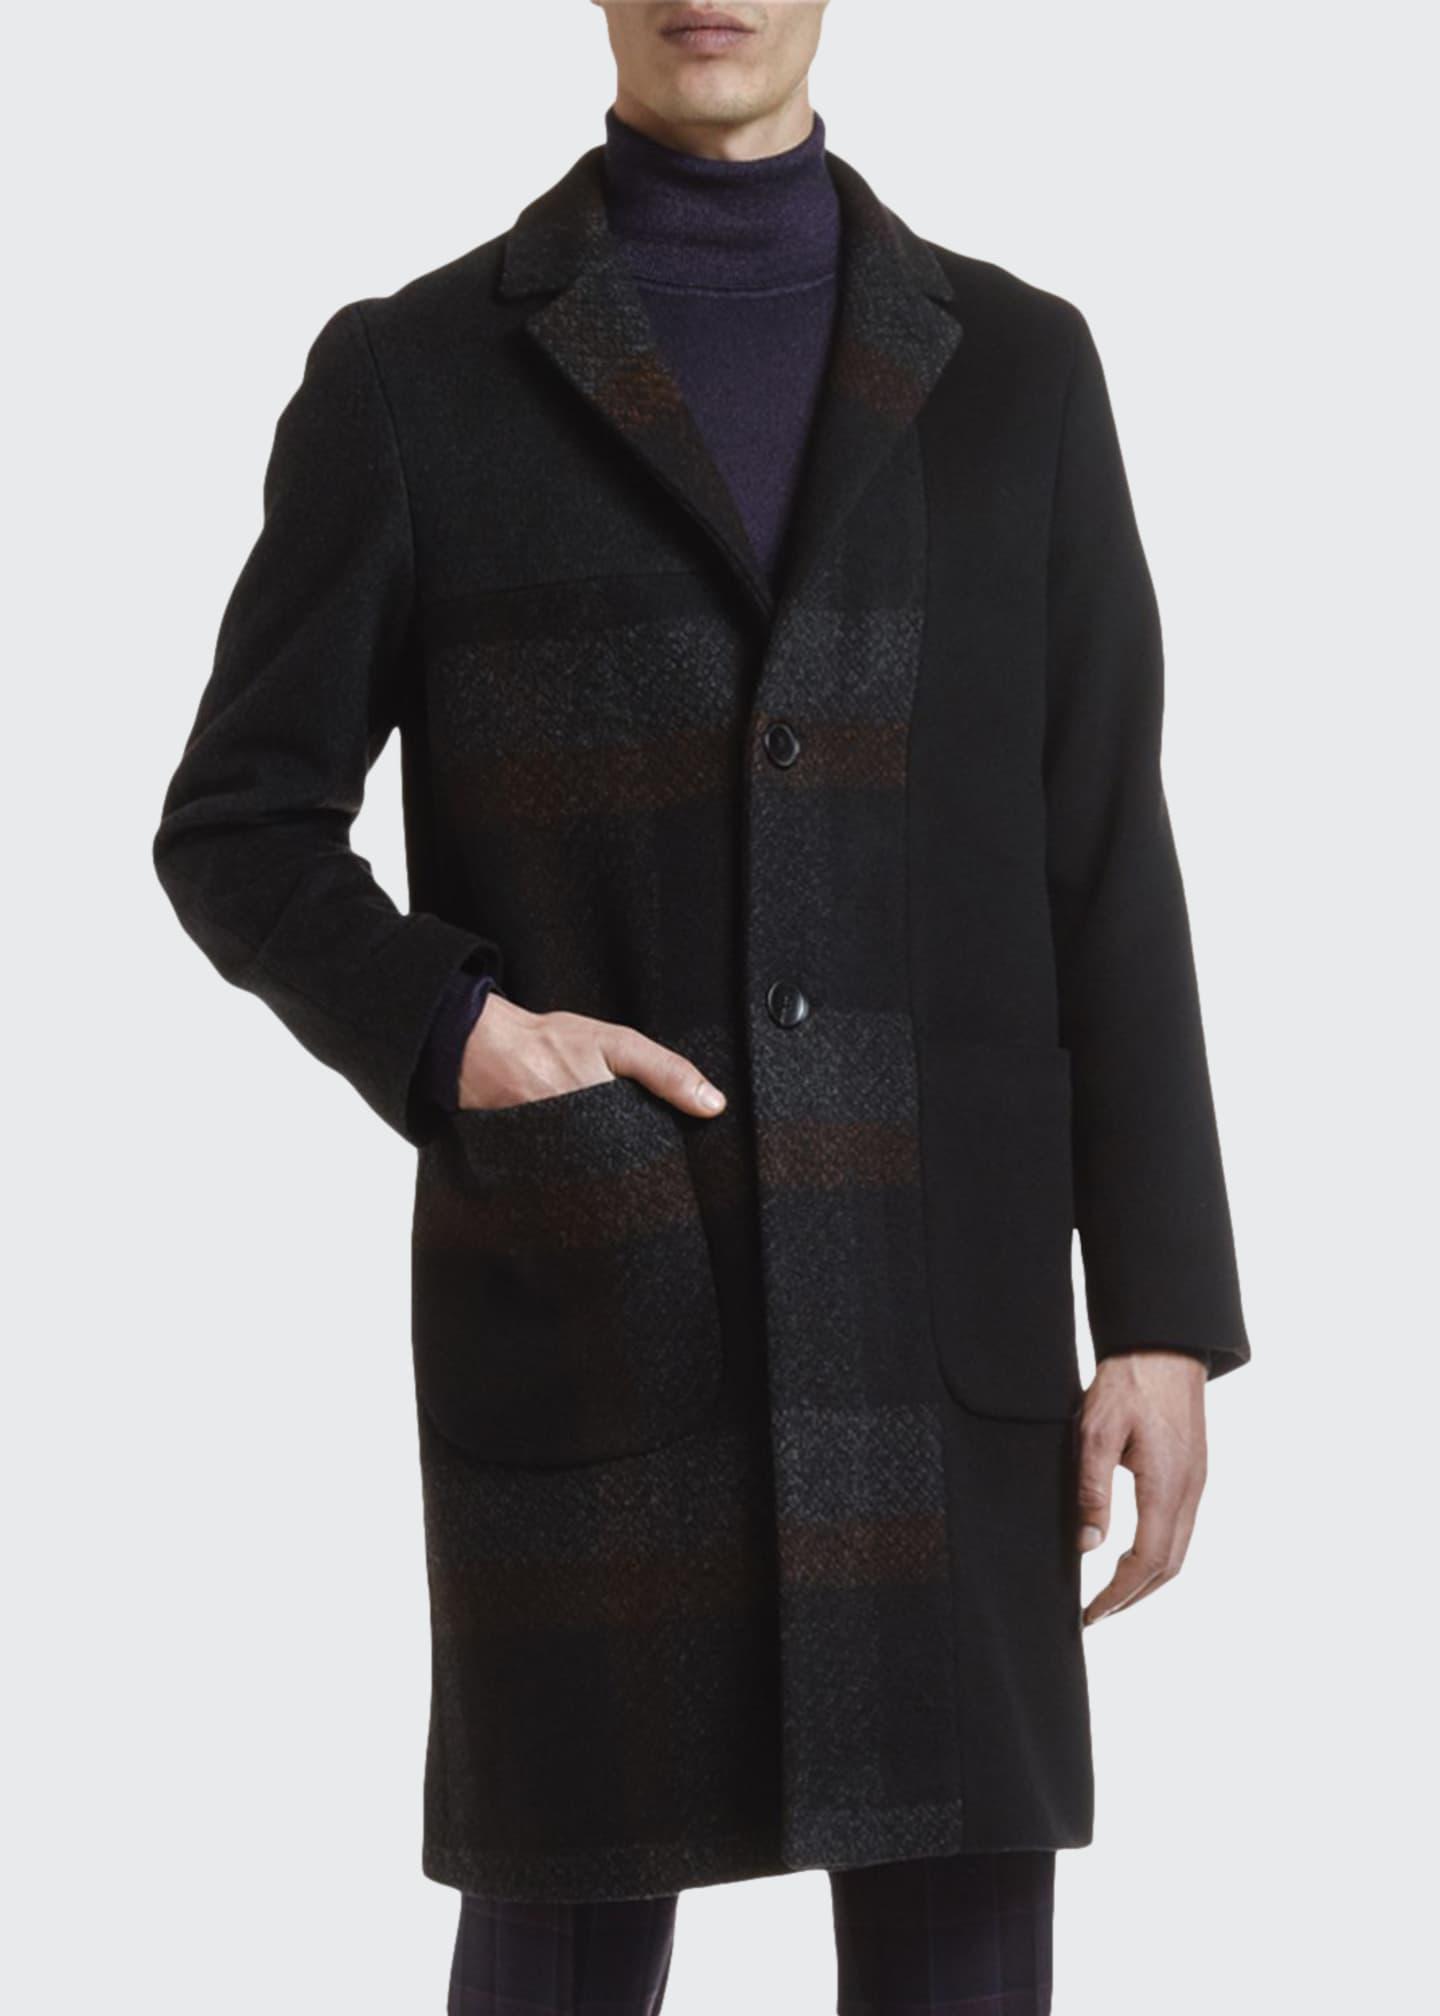 Etro Men's Easy Solid/Plaid Patchwork Overcoat